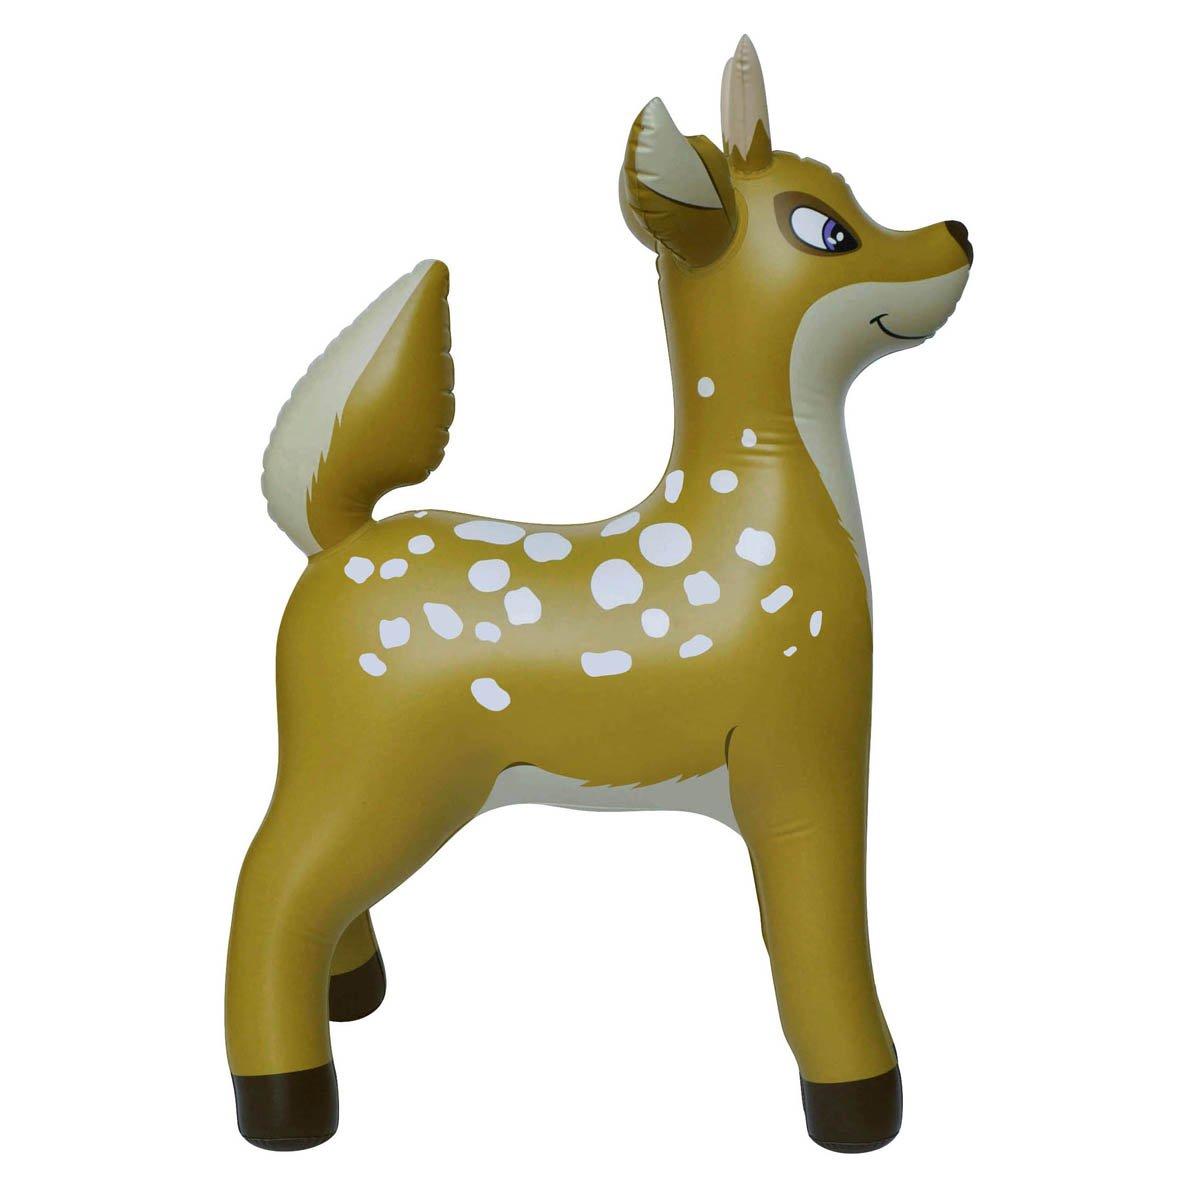 inflatable Deer , AN-Deer3 , blow up Xmas animal gift